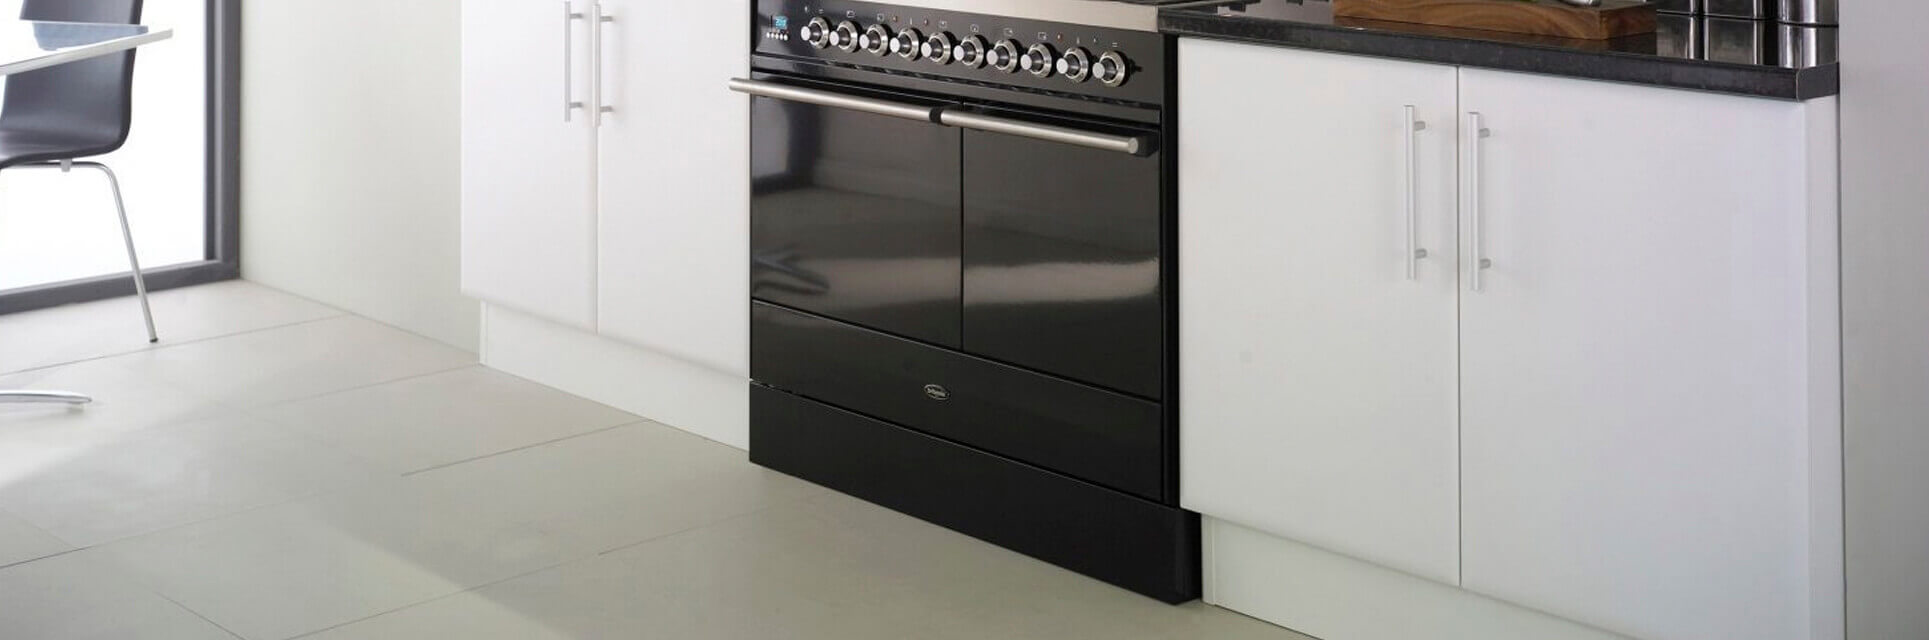 Servicio técnico hornos siemens